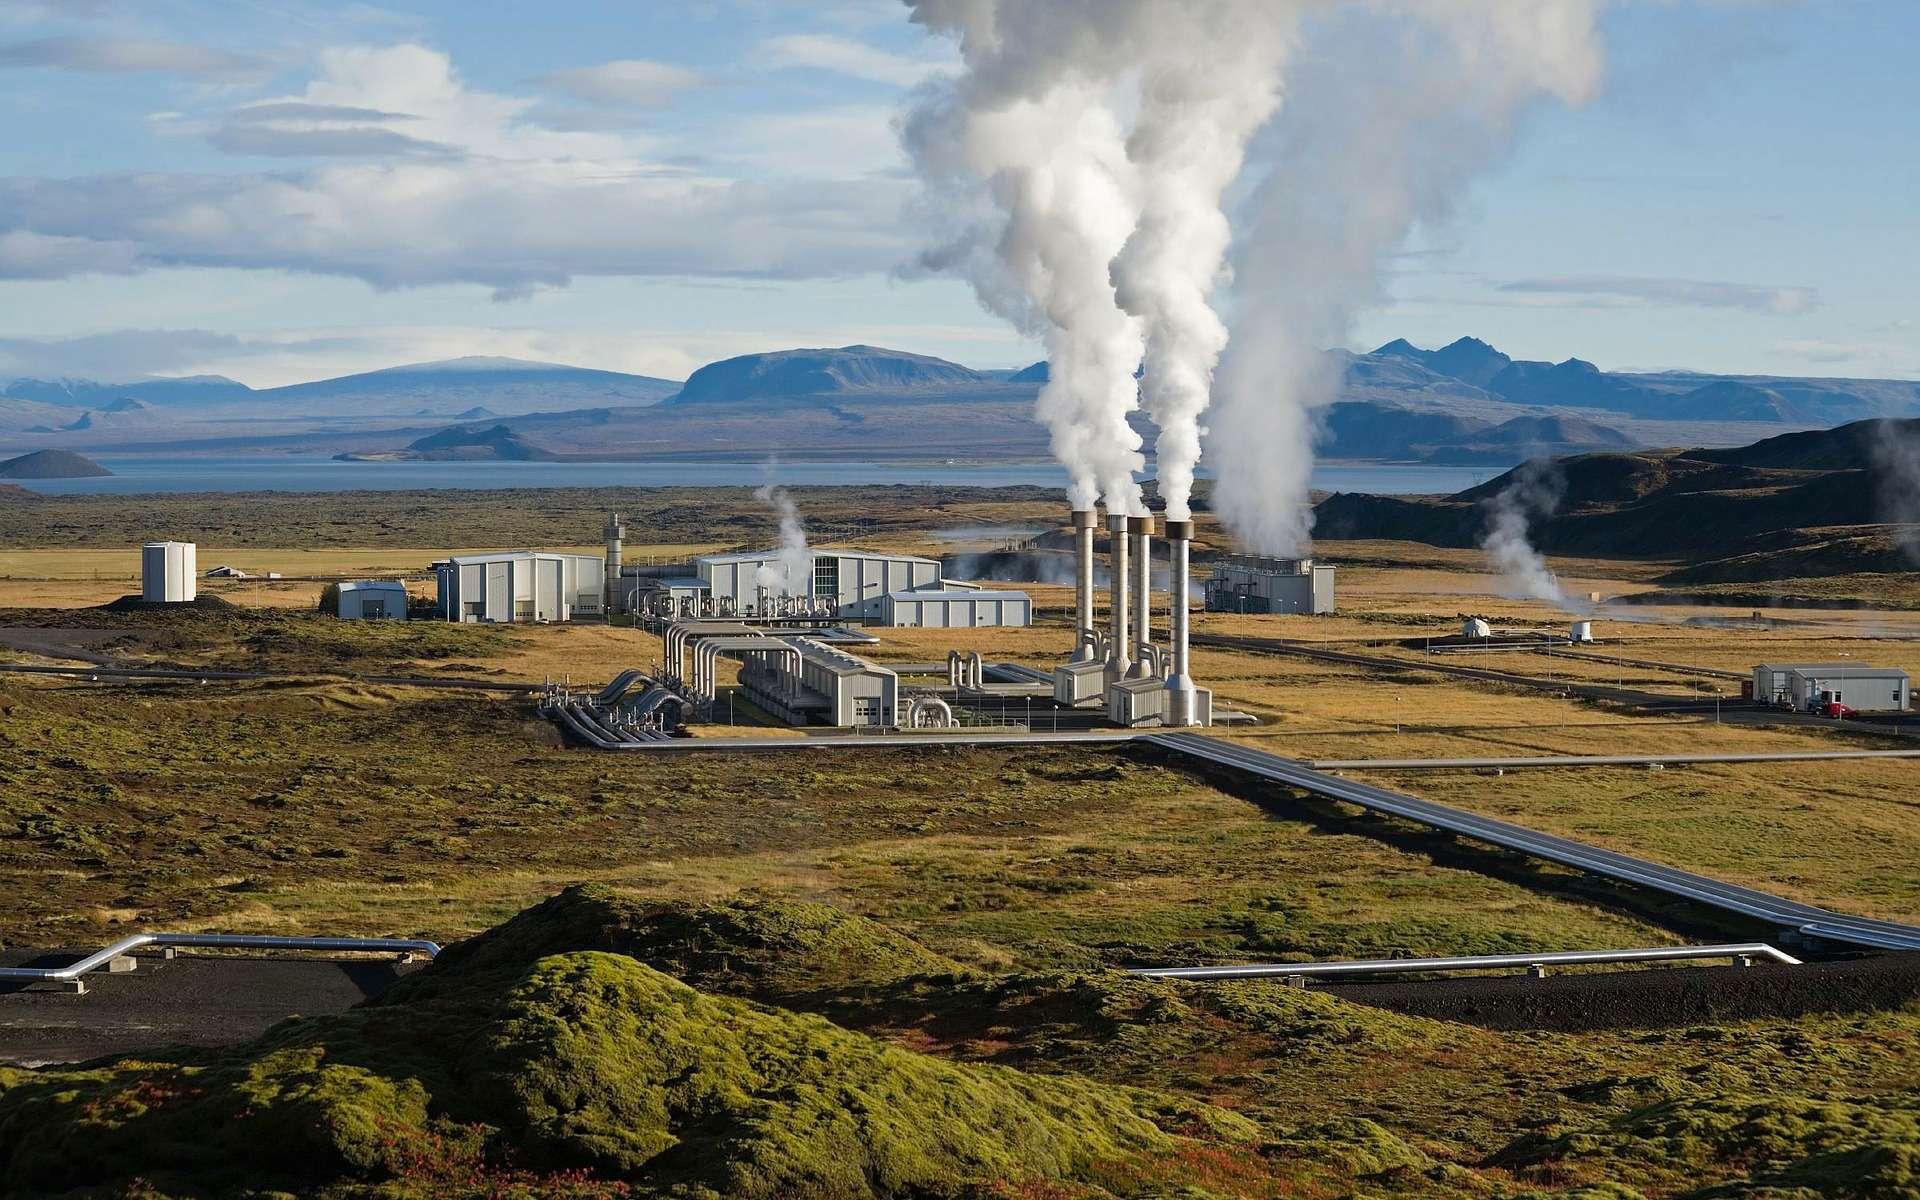 Centrale géothermique en Islande. © Wikilmages, Pixabay